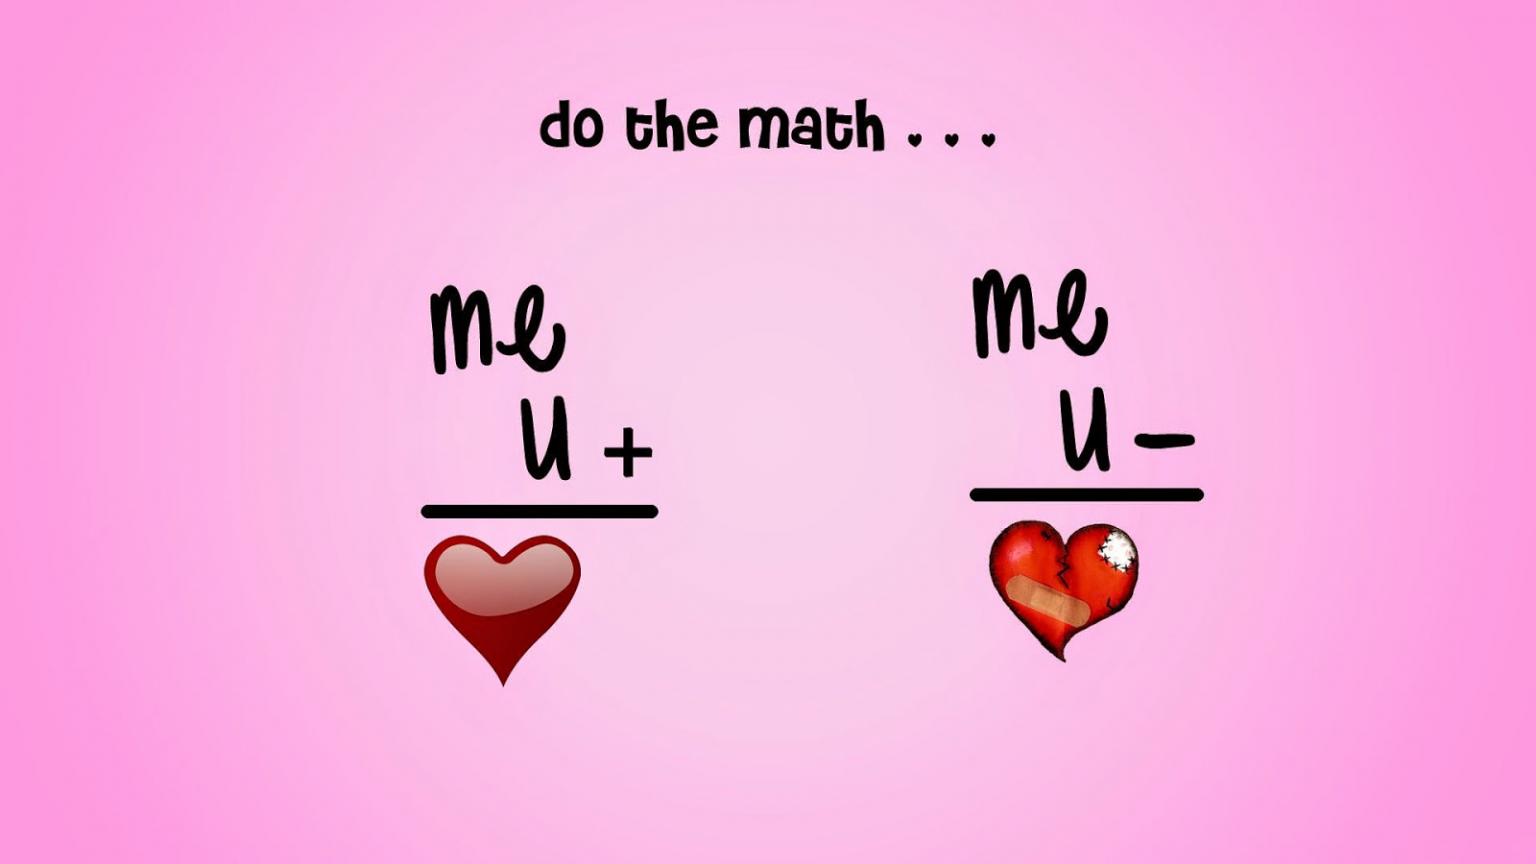 kata cinta lucu dan r tis x for your